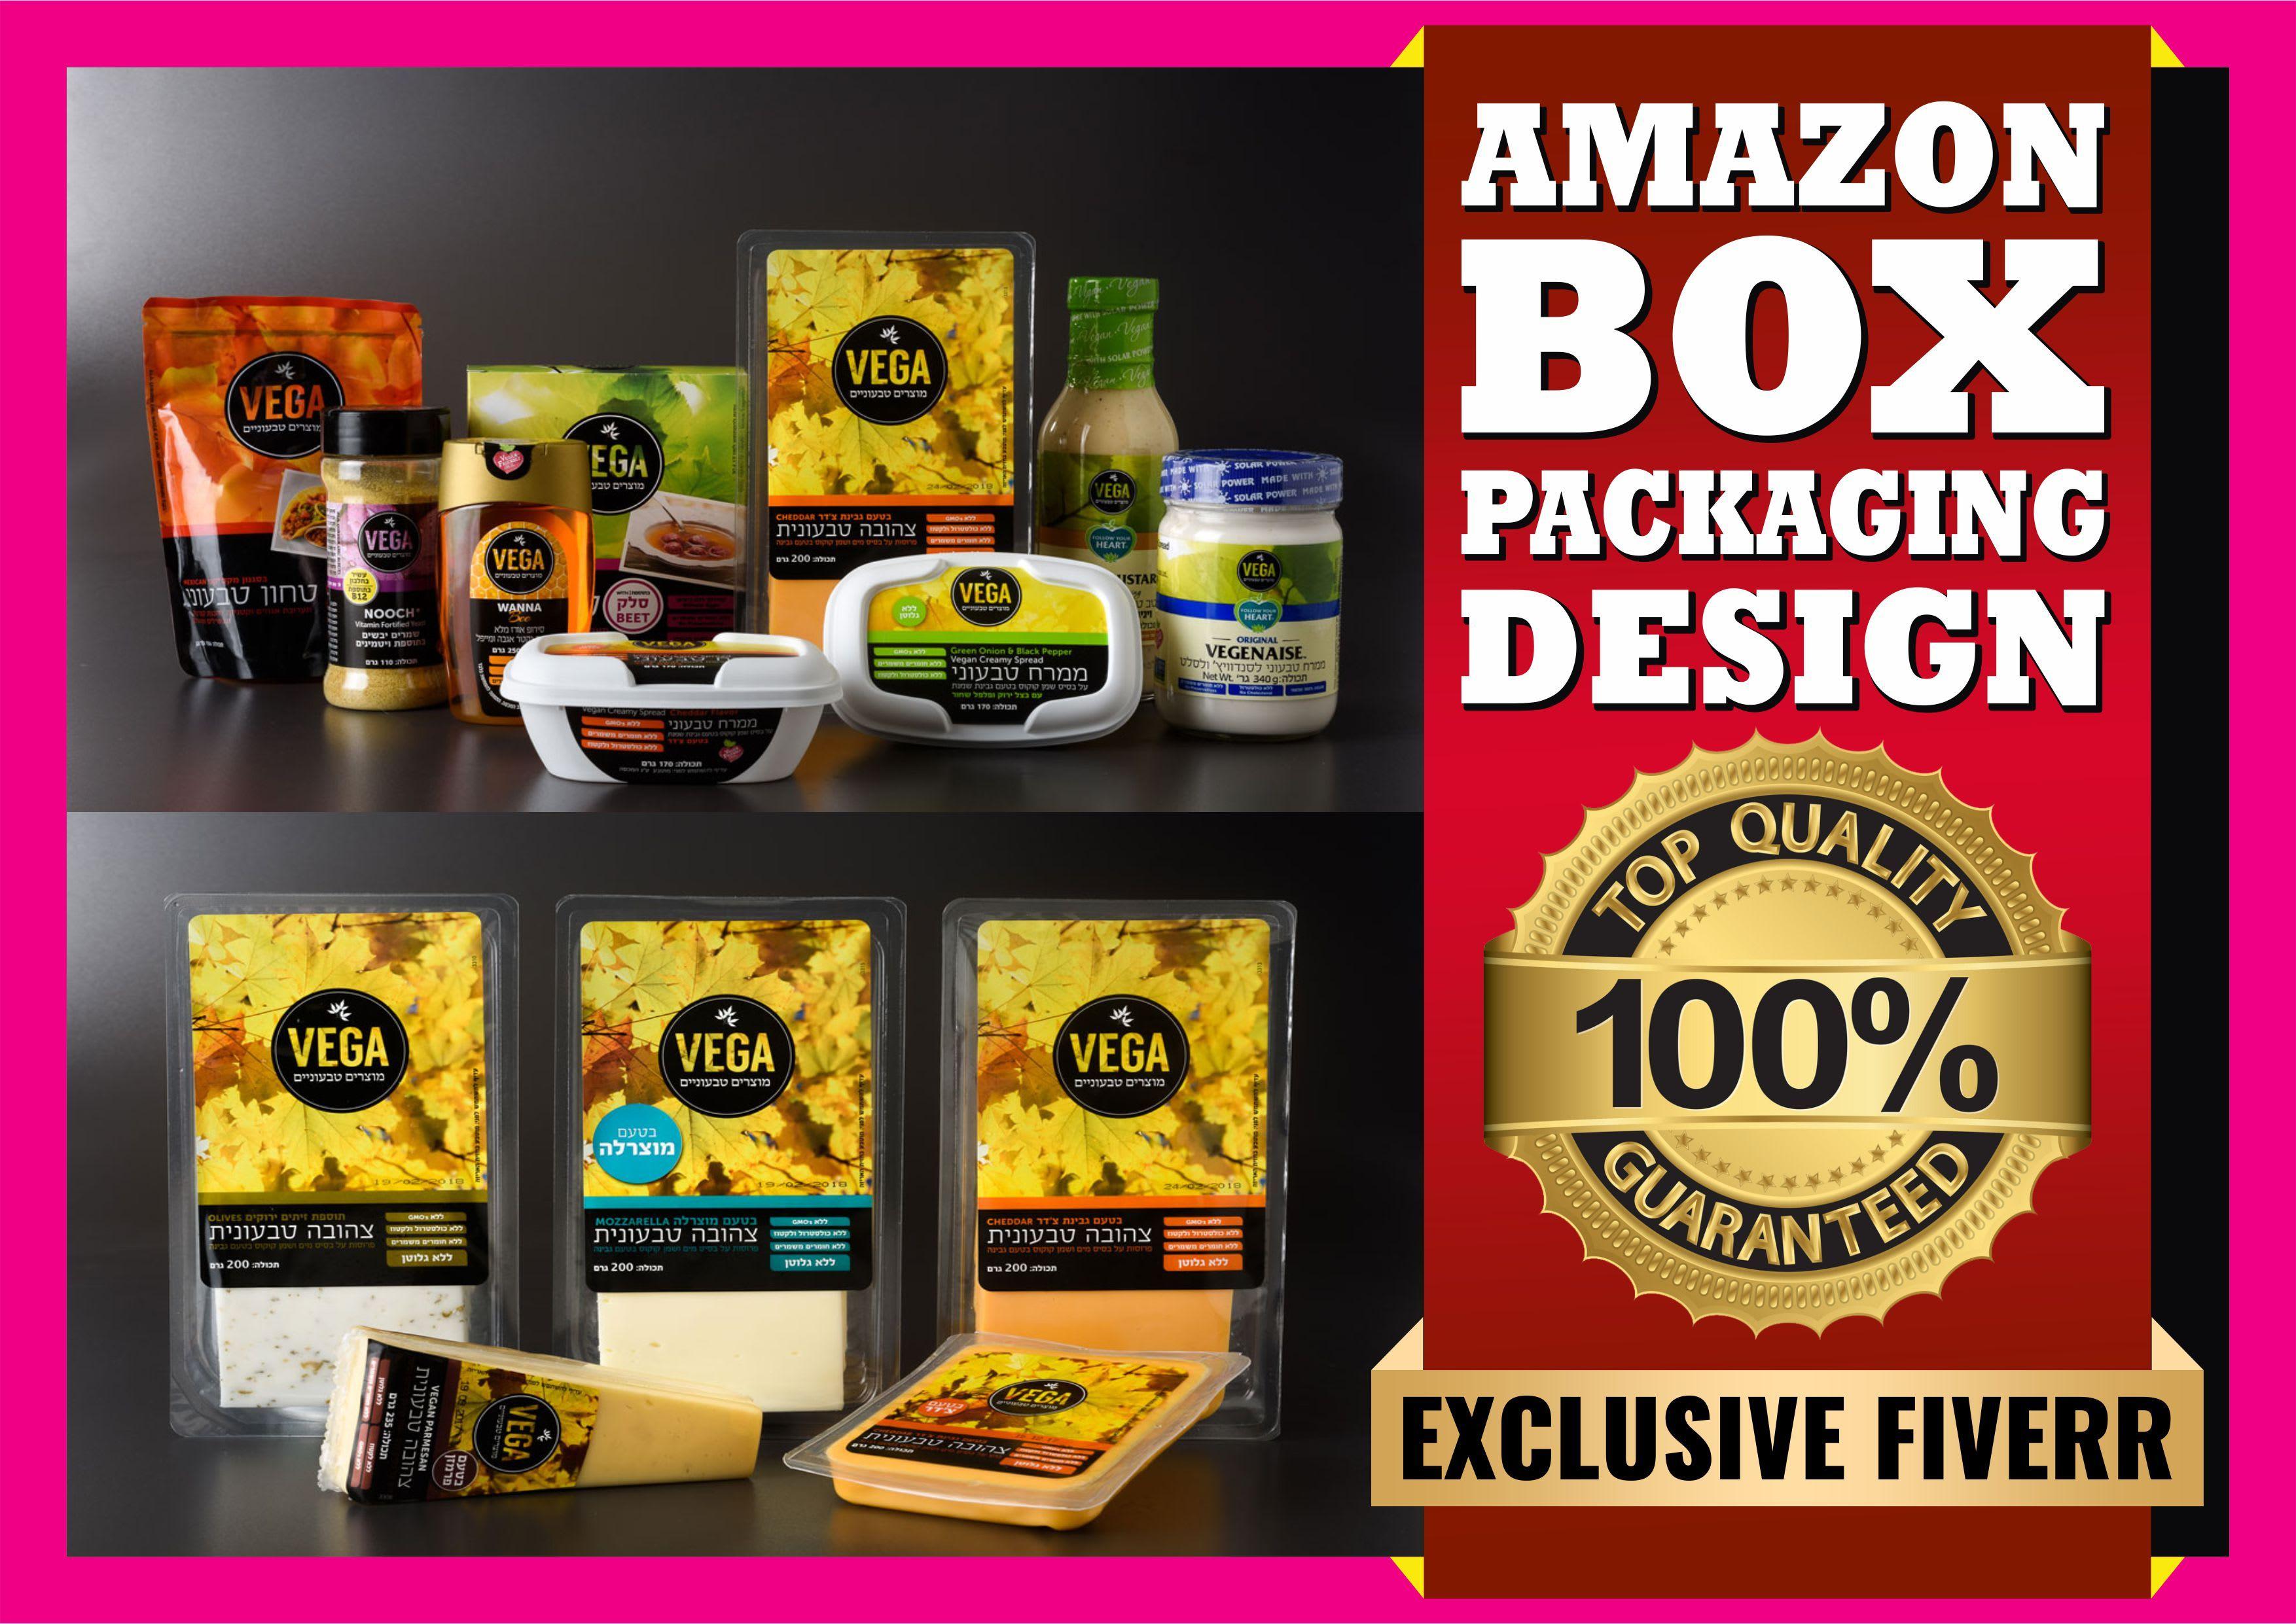 Download Amazon Box Packaging Design Box Packaging Design Unique Packaging Design Packaging Design